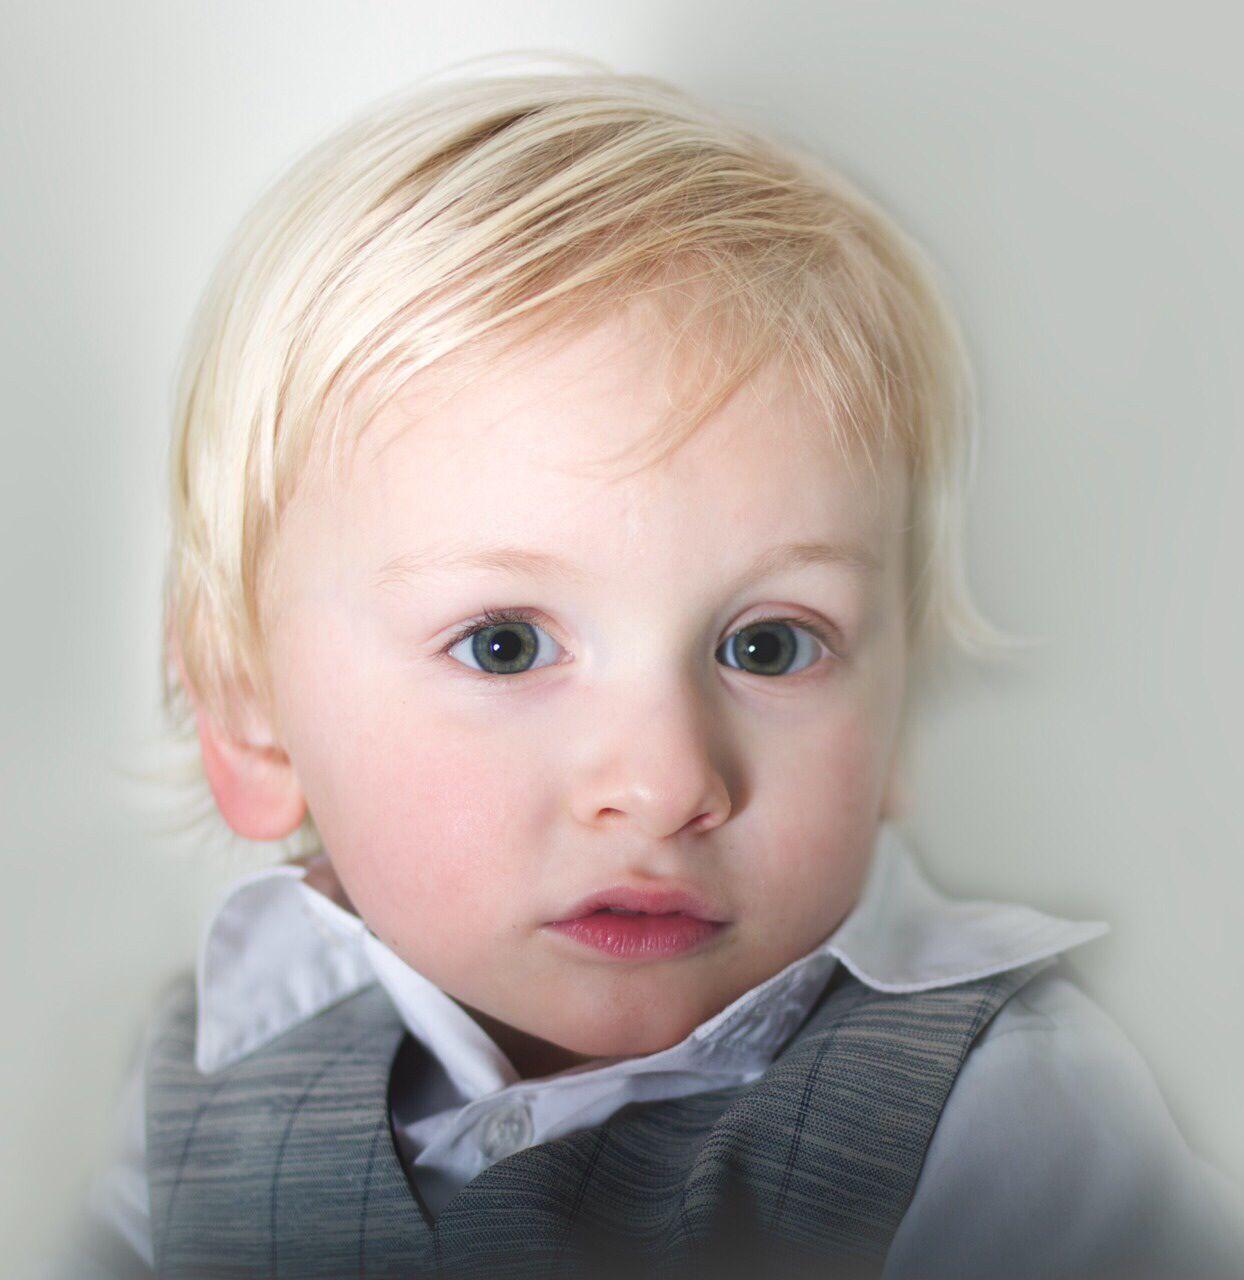 Headshots #editing #headshots #portrait #photography #kidphotography